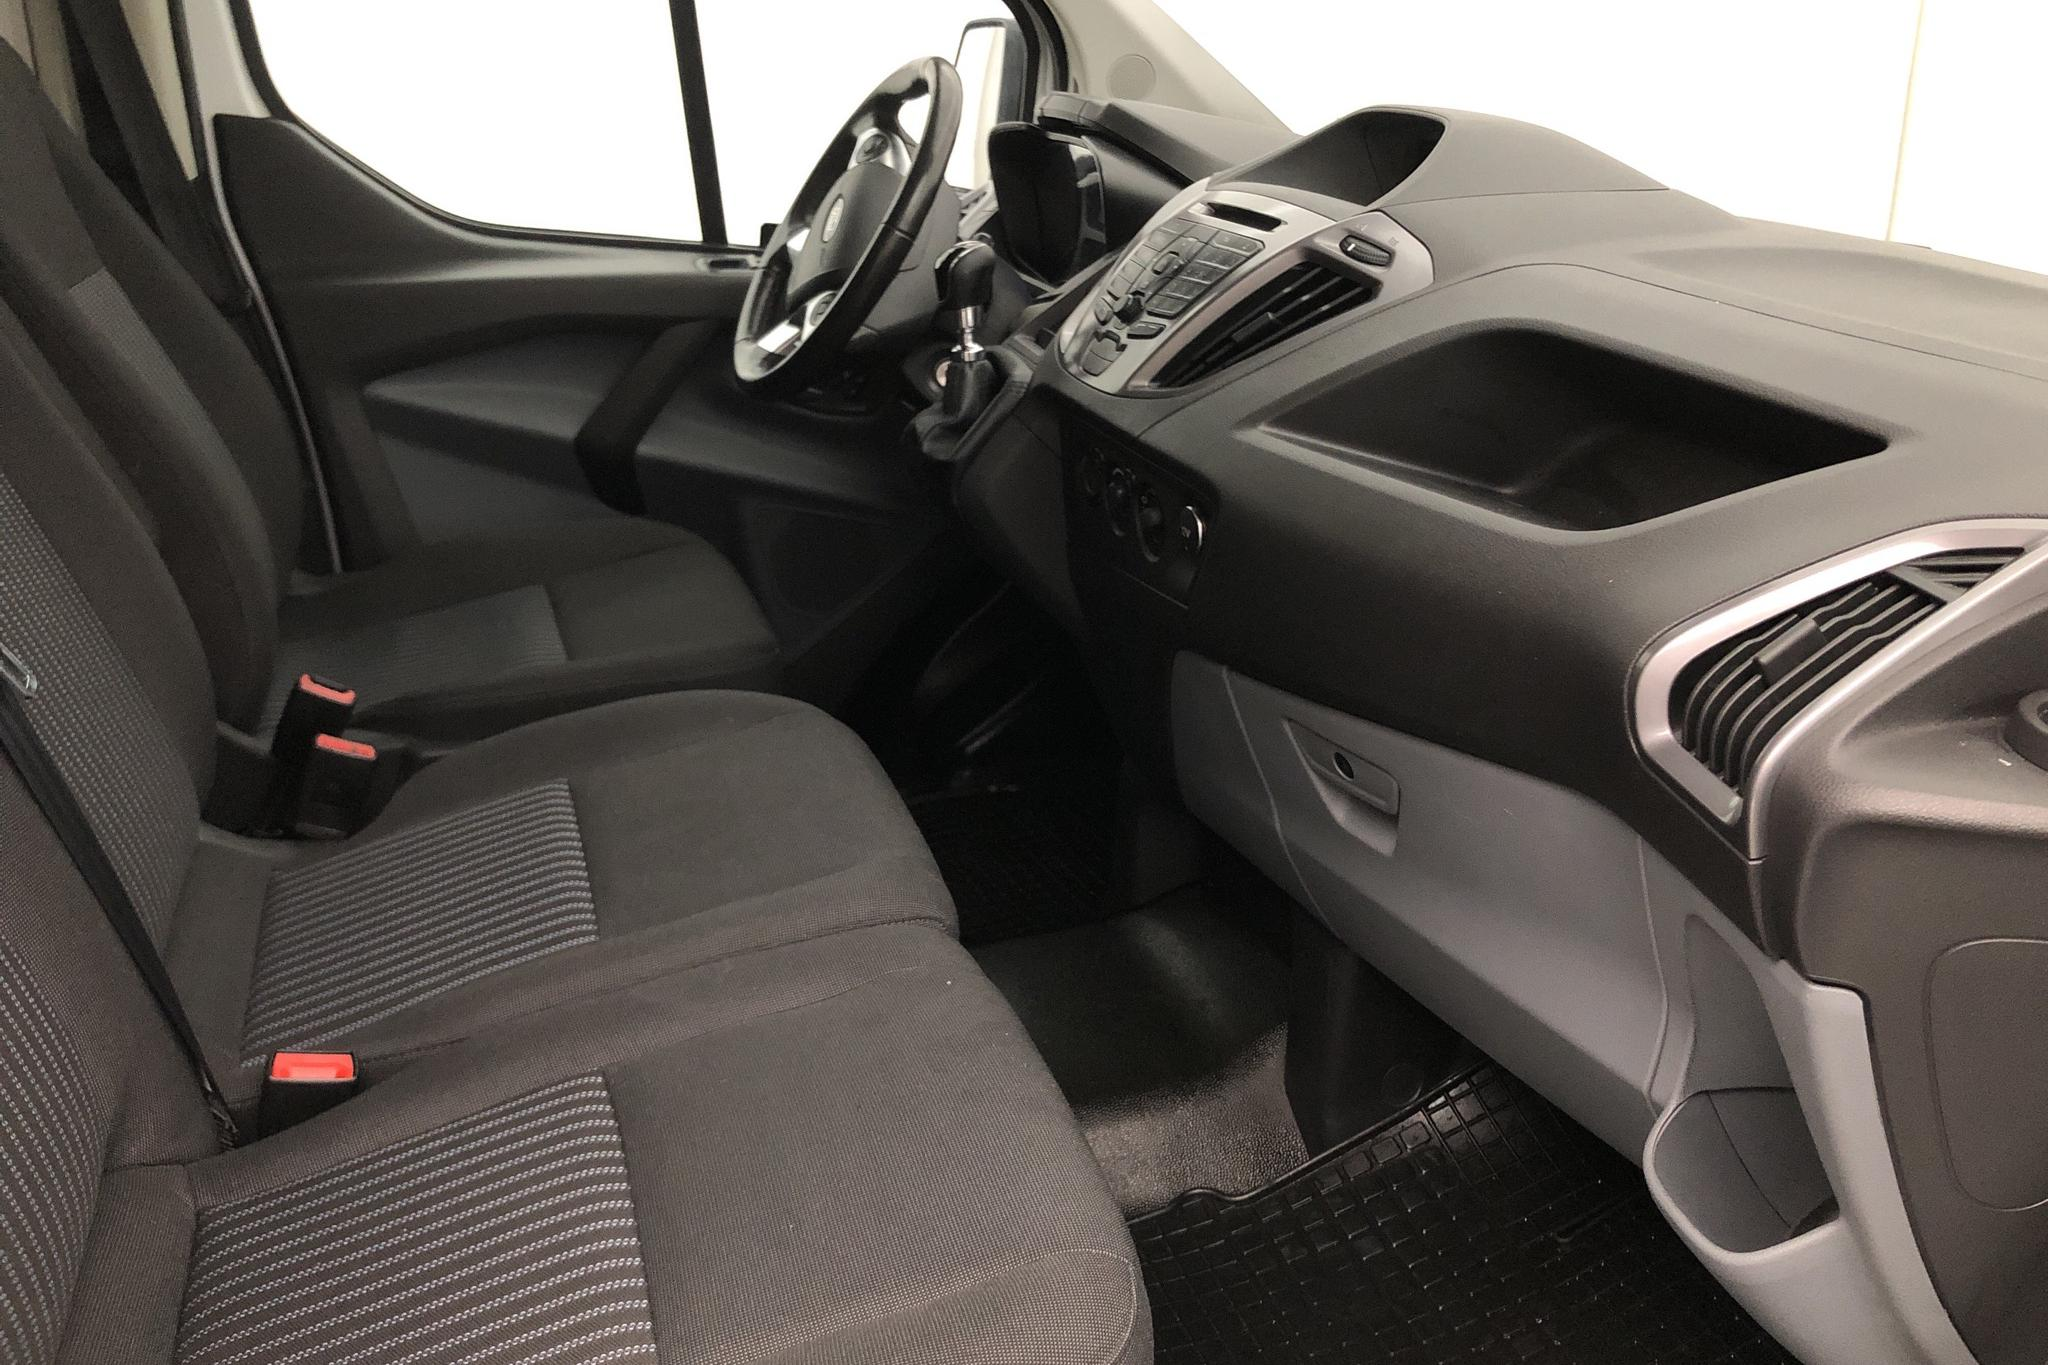 Ford Transit Custom 270 (125hk) - 179 000 km - Manual - white - 2016